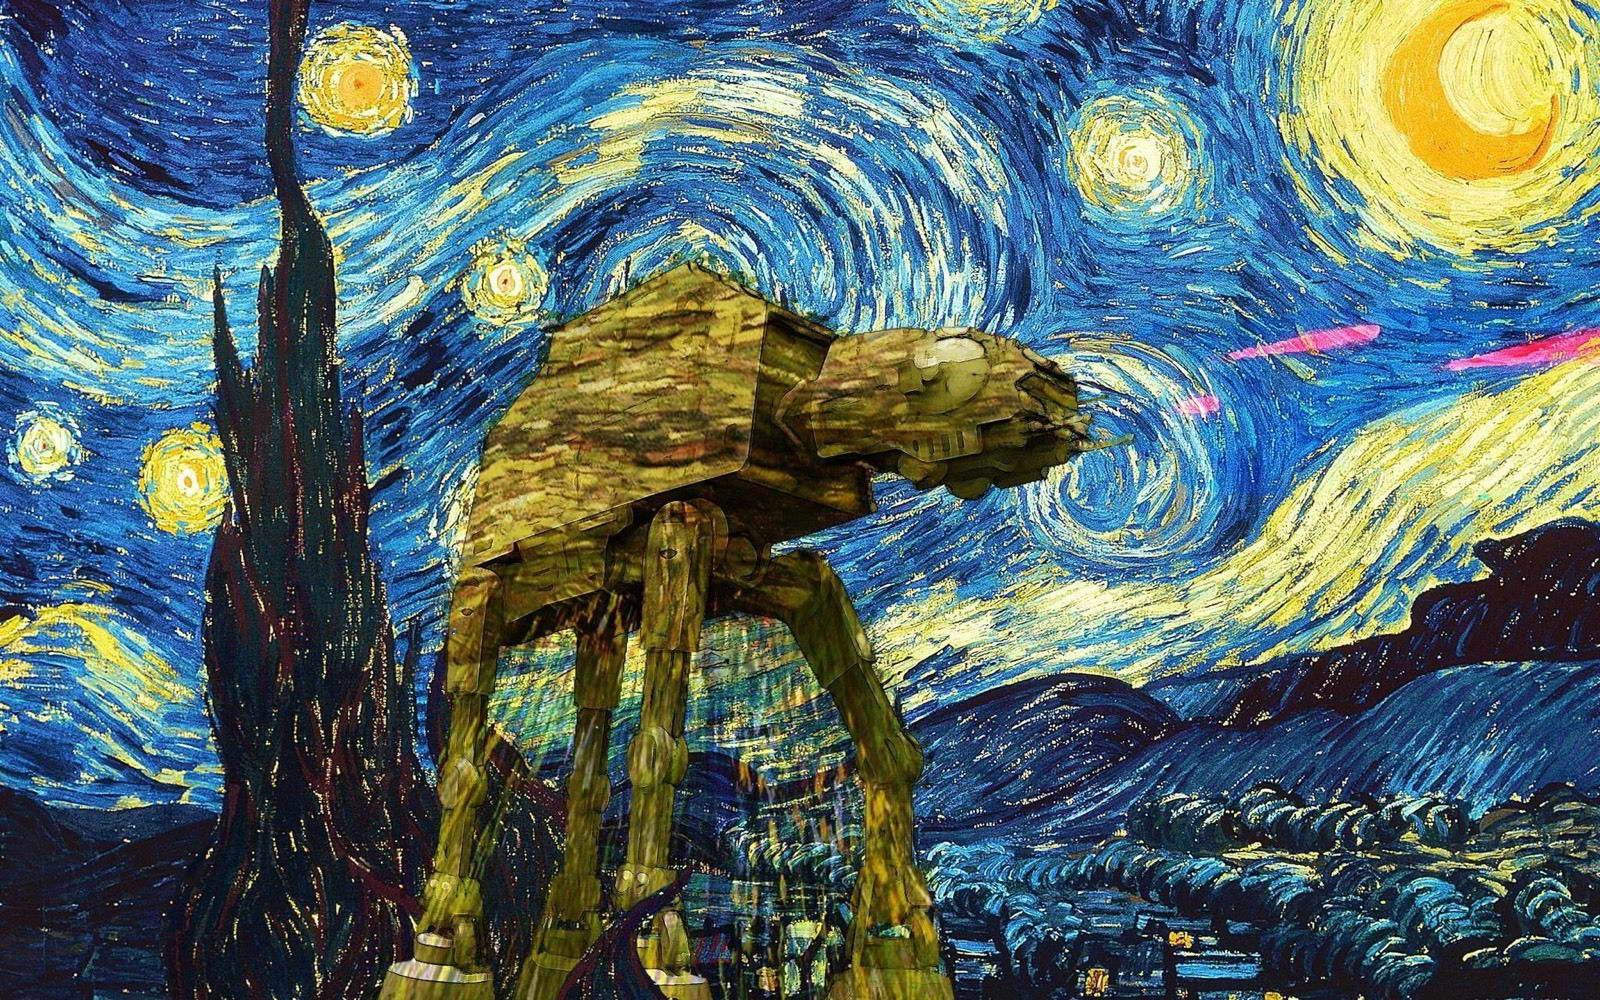 00146 STAR WARS AND VAN GOGH STARRY NIGHT ART IMAGE Poster Print | eBay